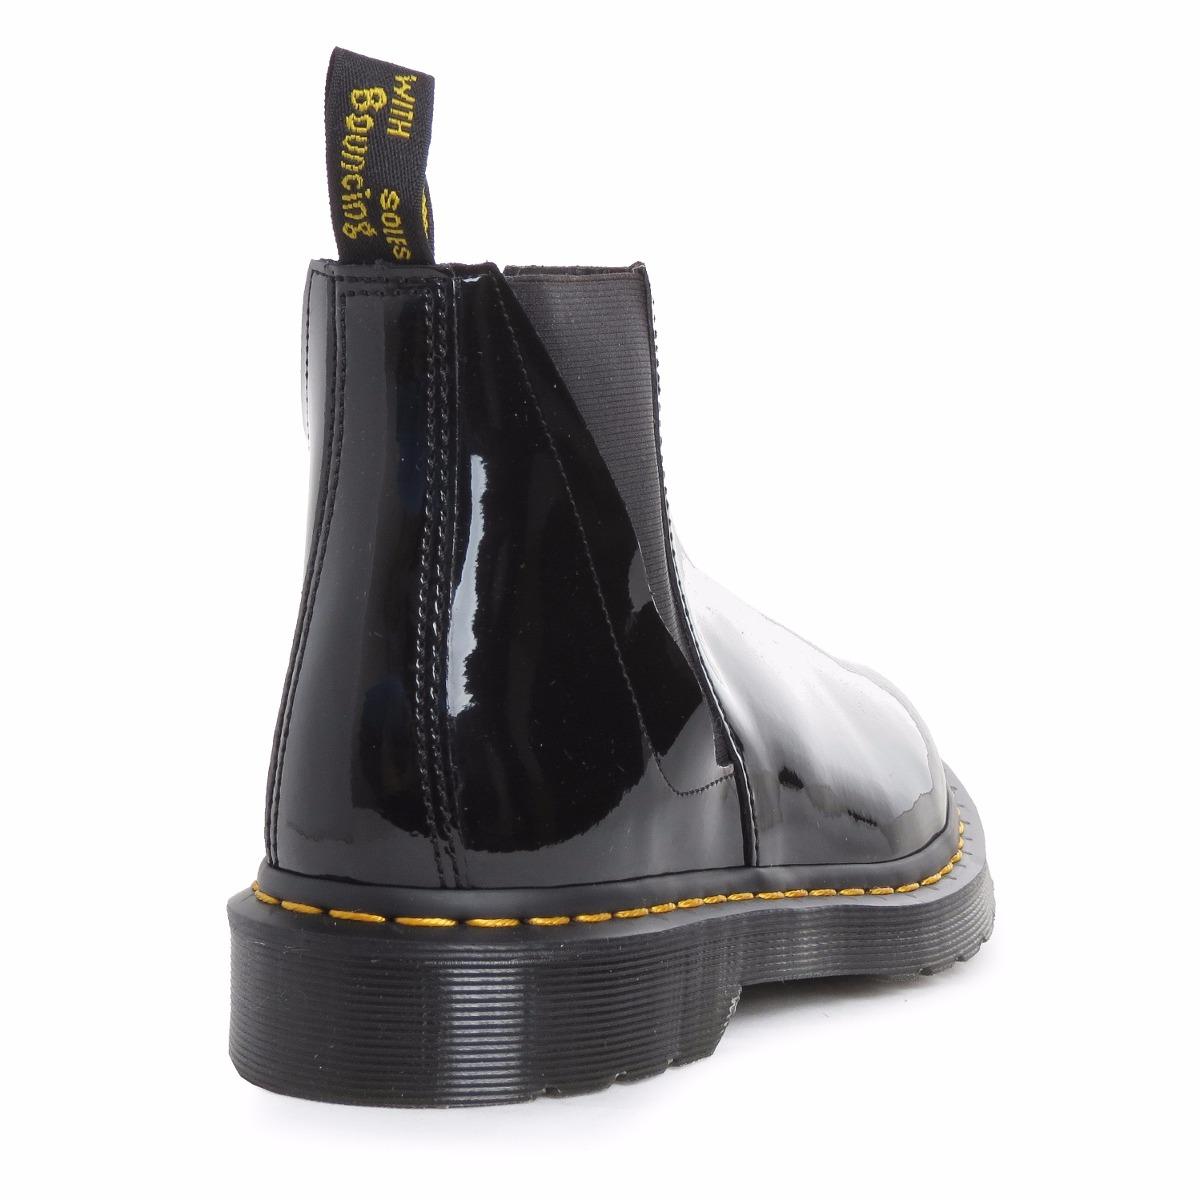 539d0ee4af227 Cargando zoom... zapatos bota media dr martens bianca charol mujer  importados